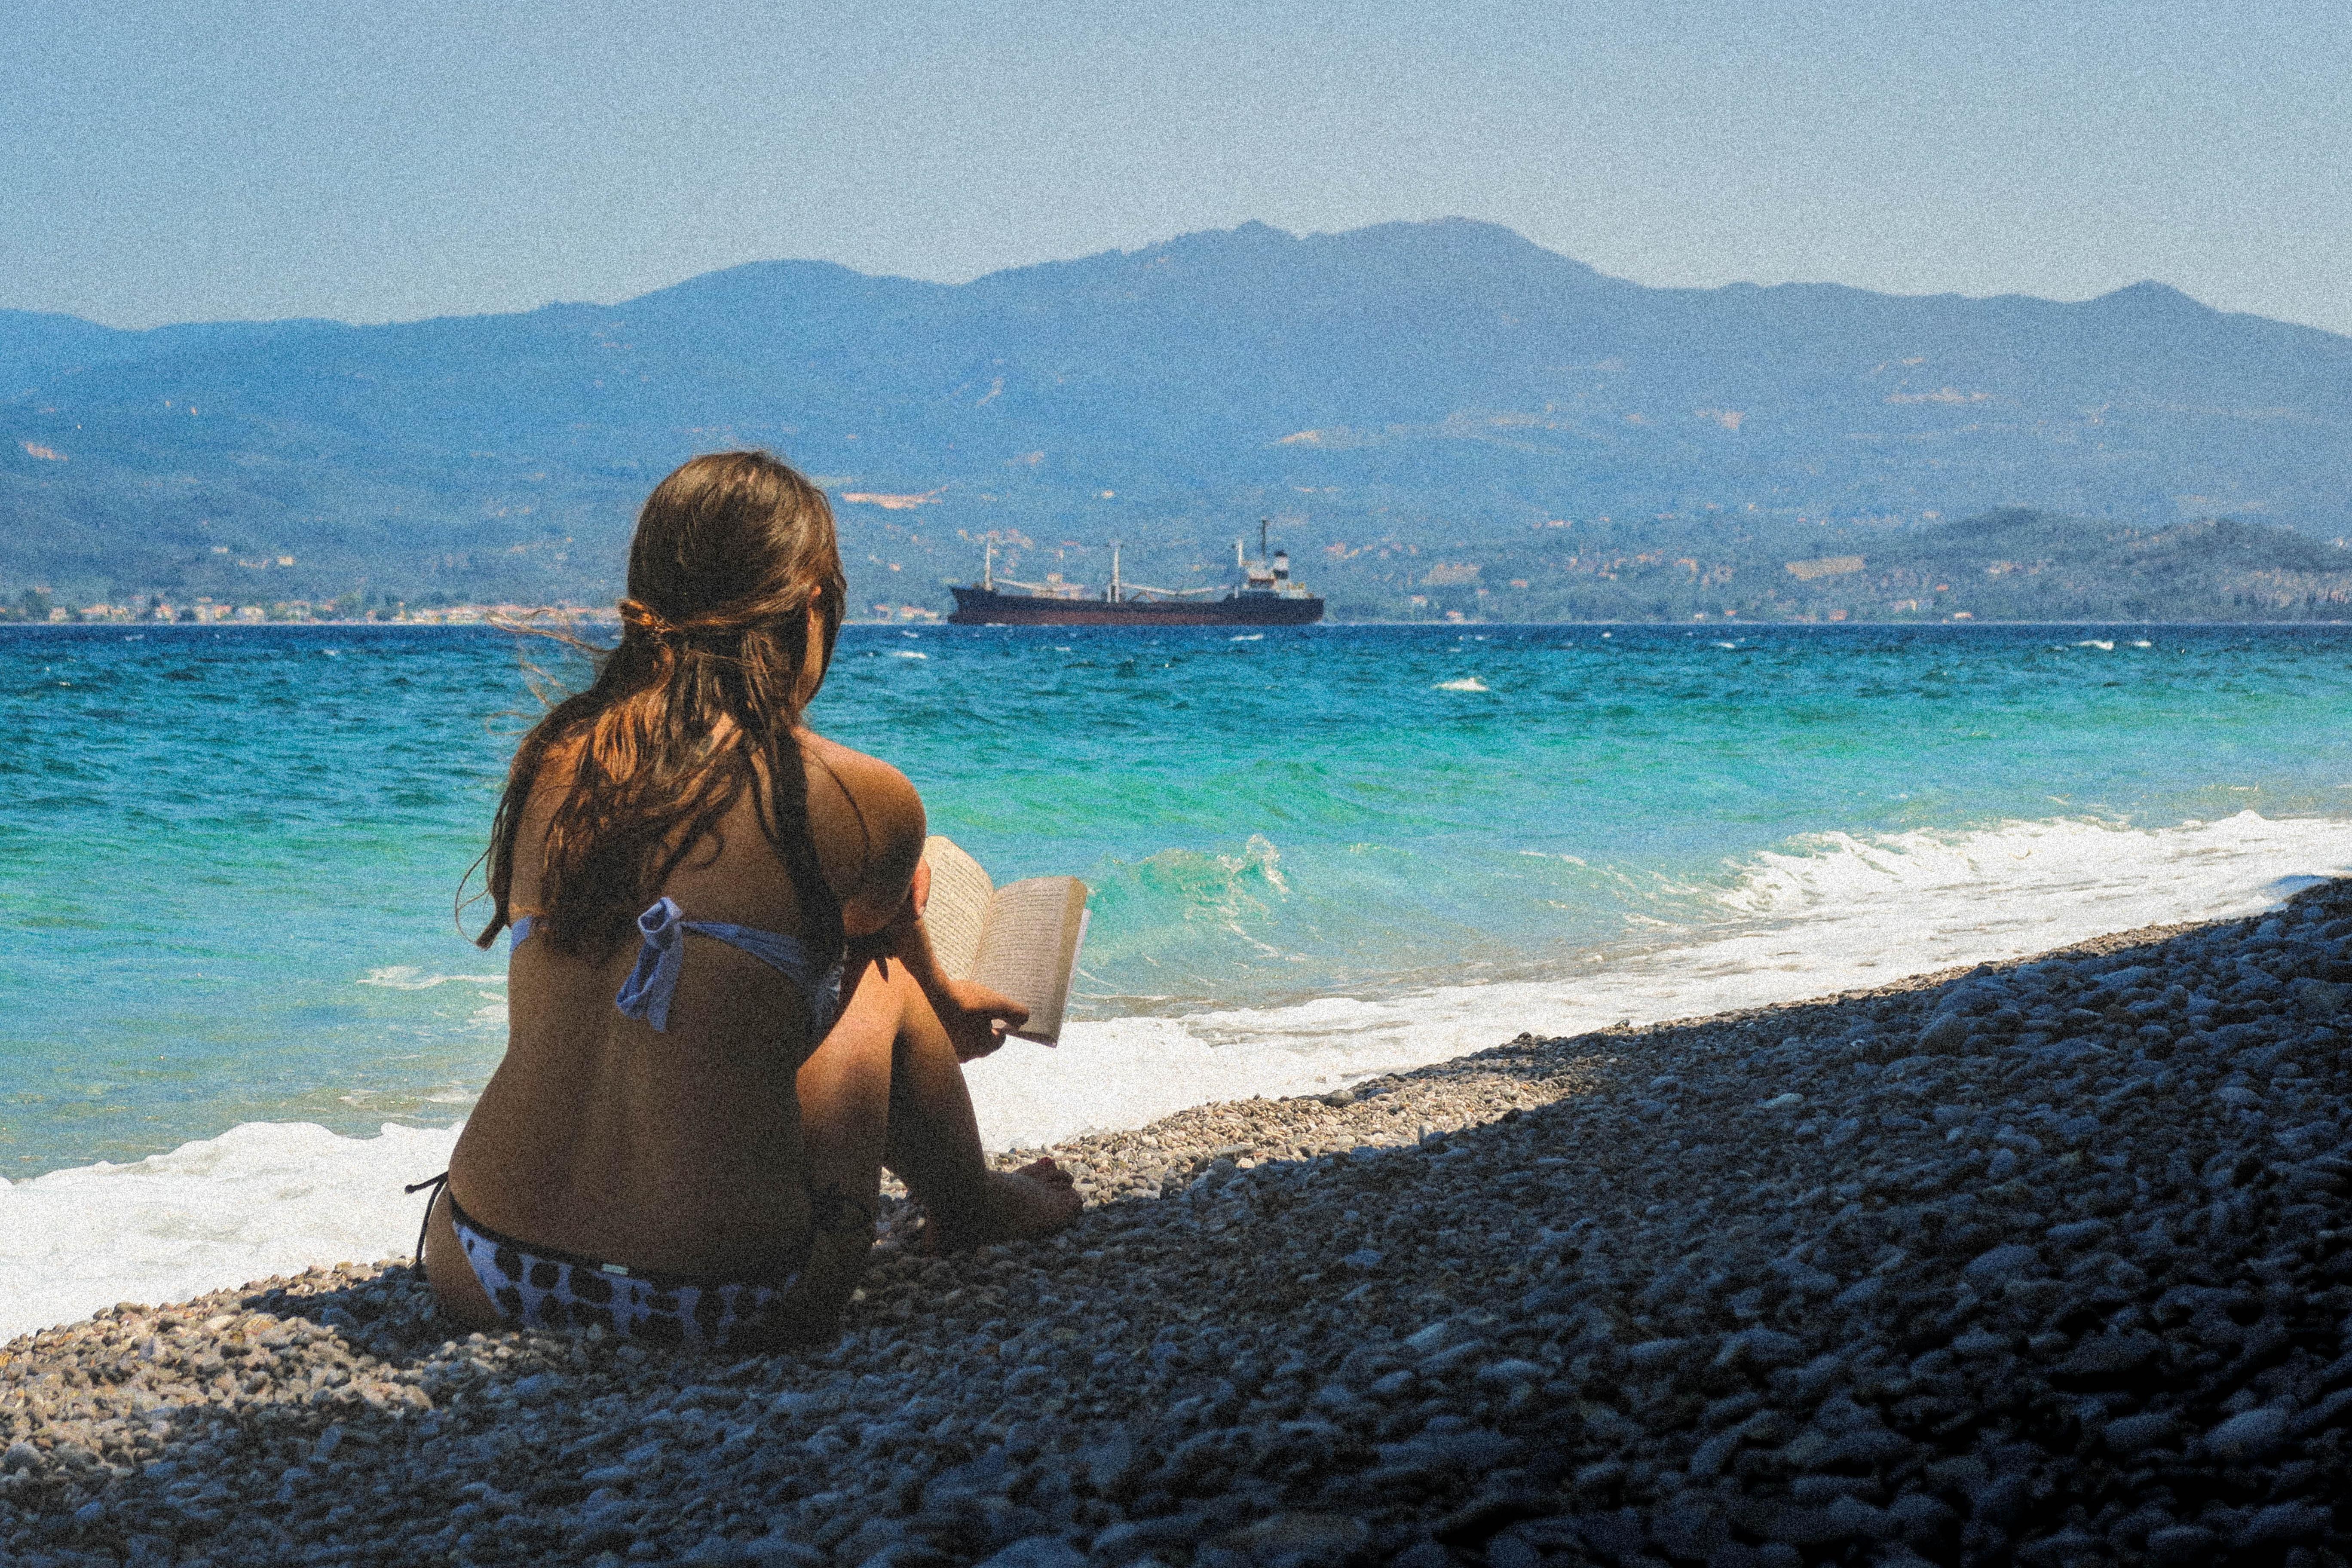 Woman in a bikini sitting on a pebble beach reading a book at Glifa